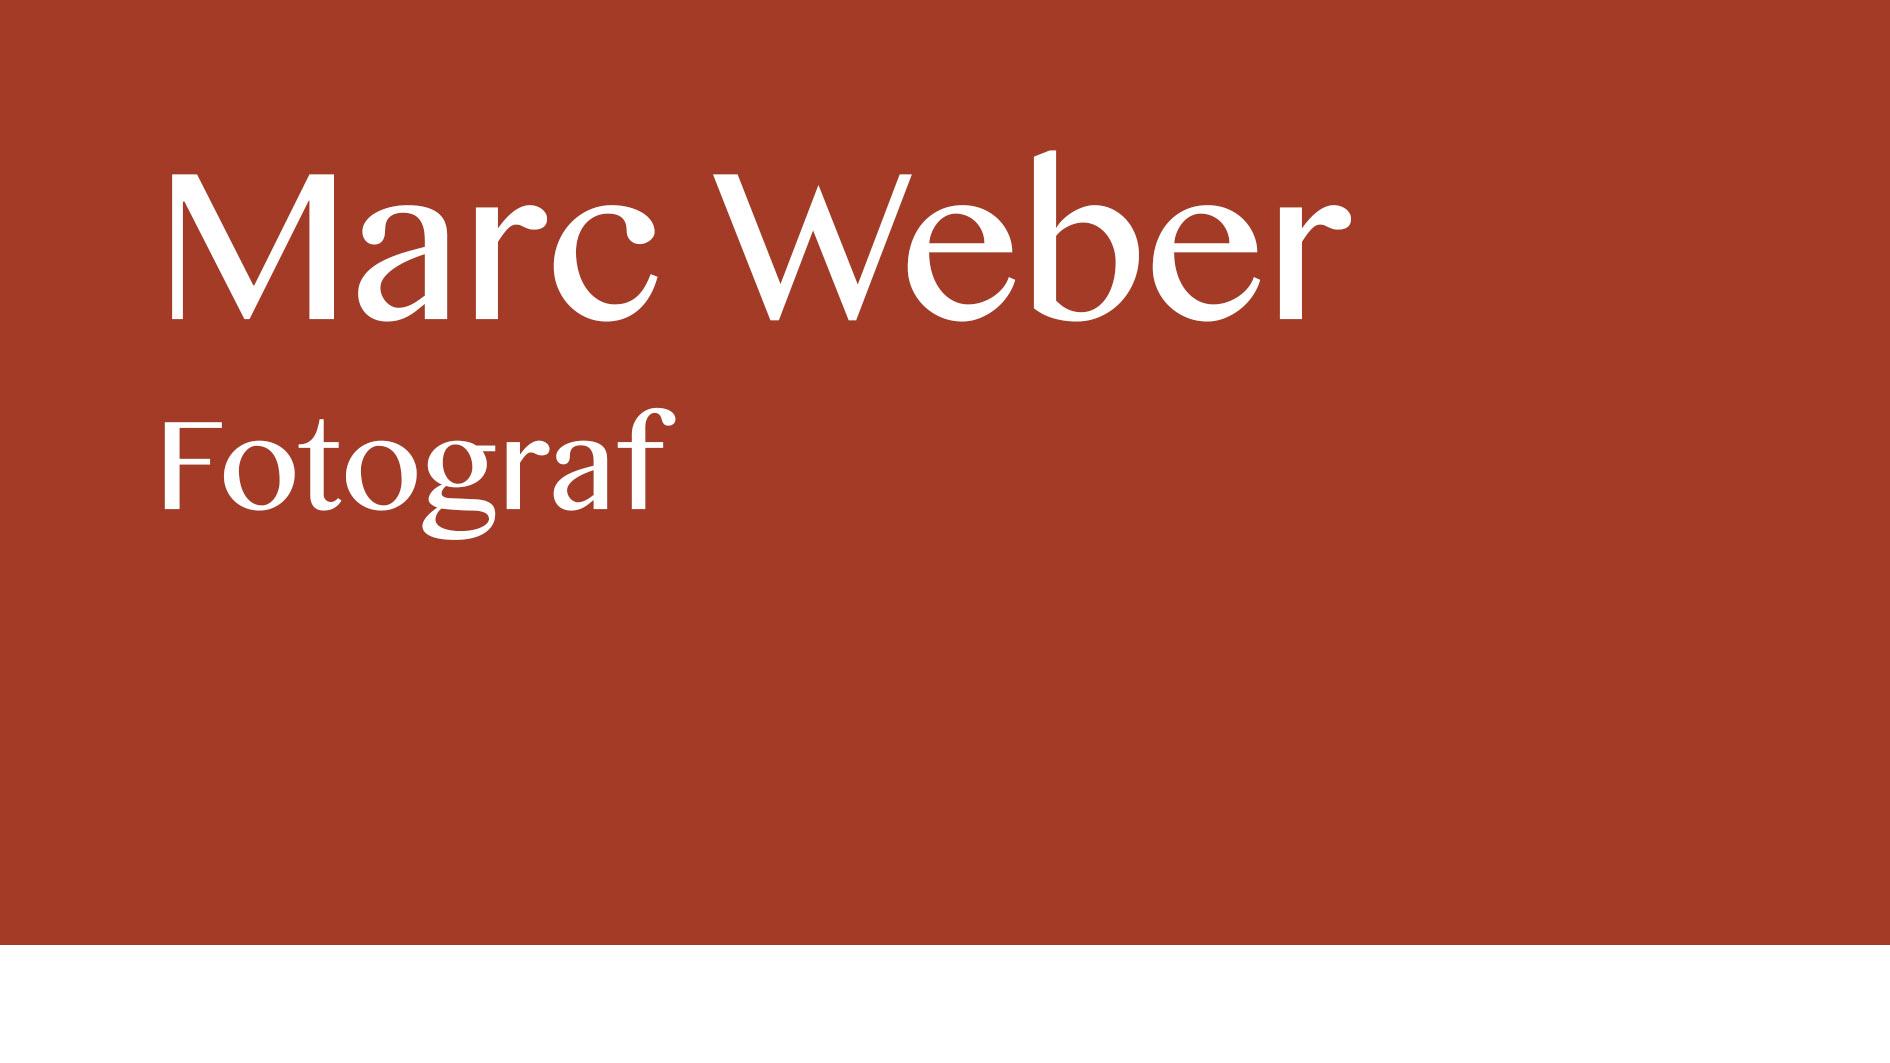 MARC WEBER